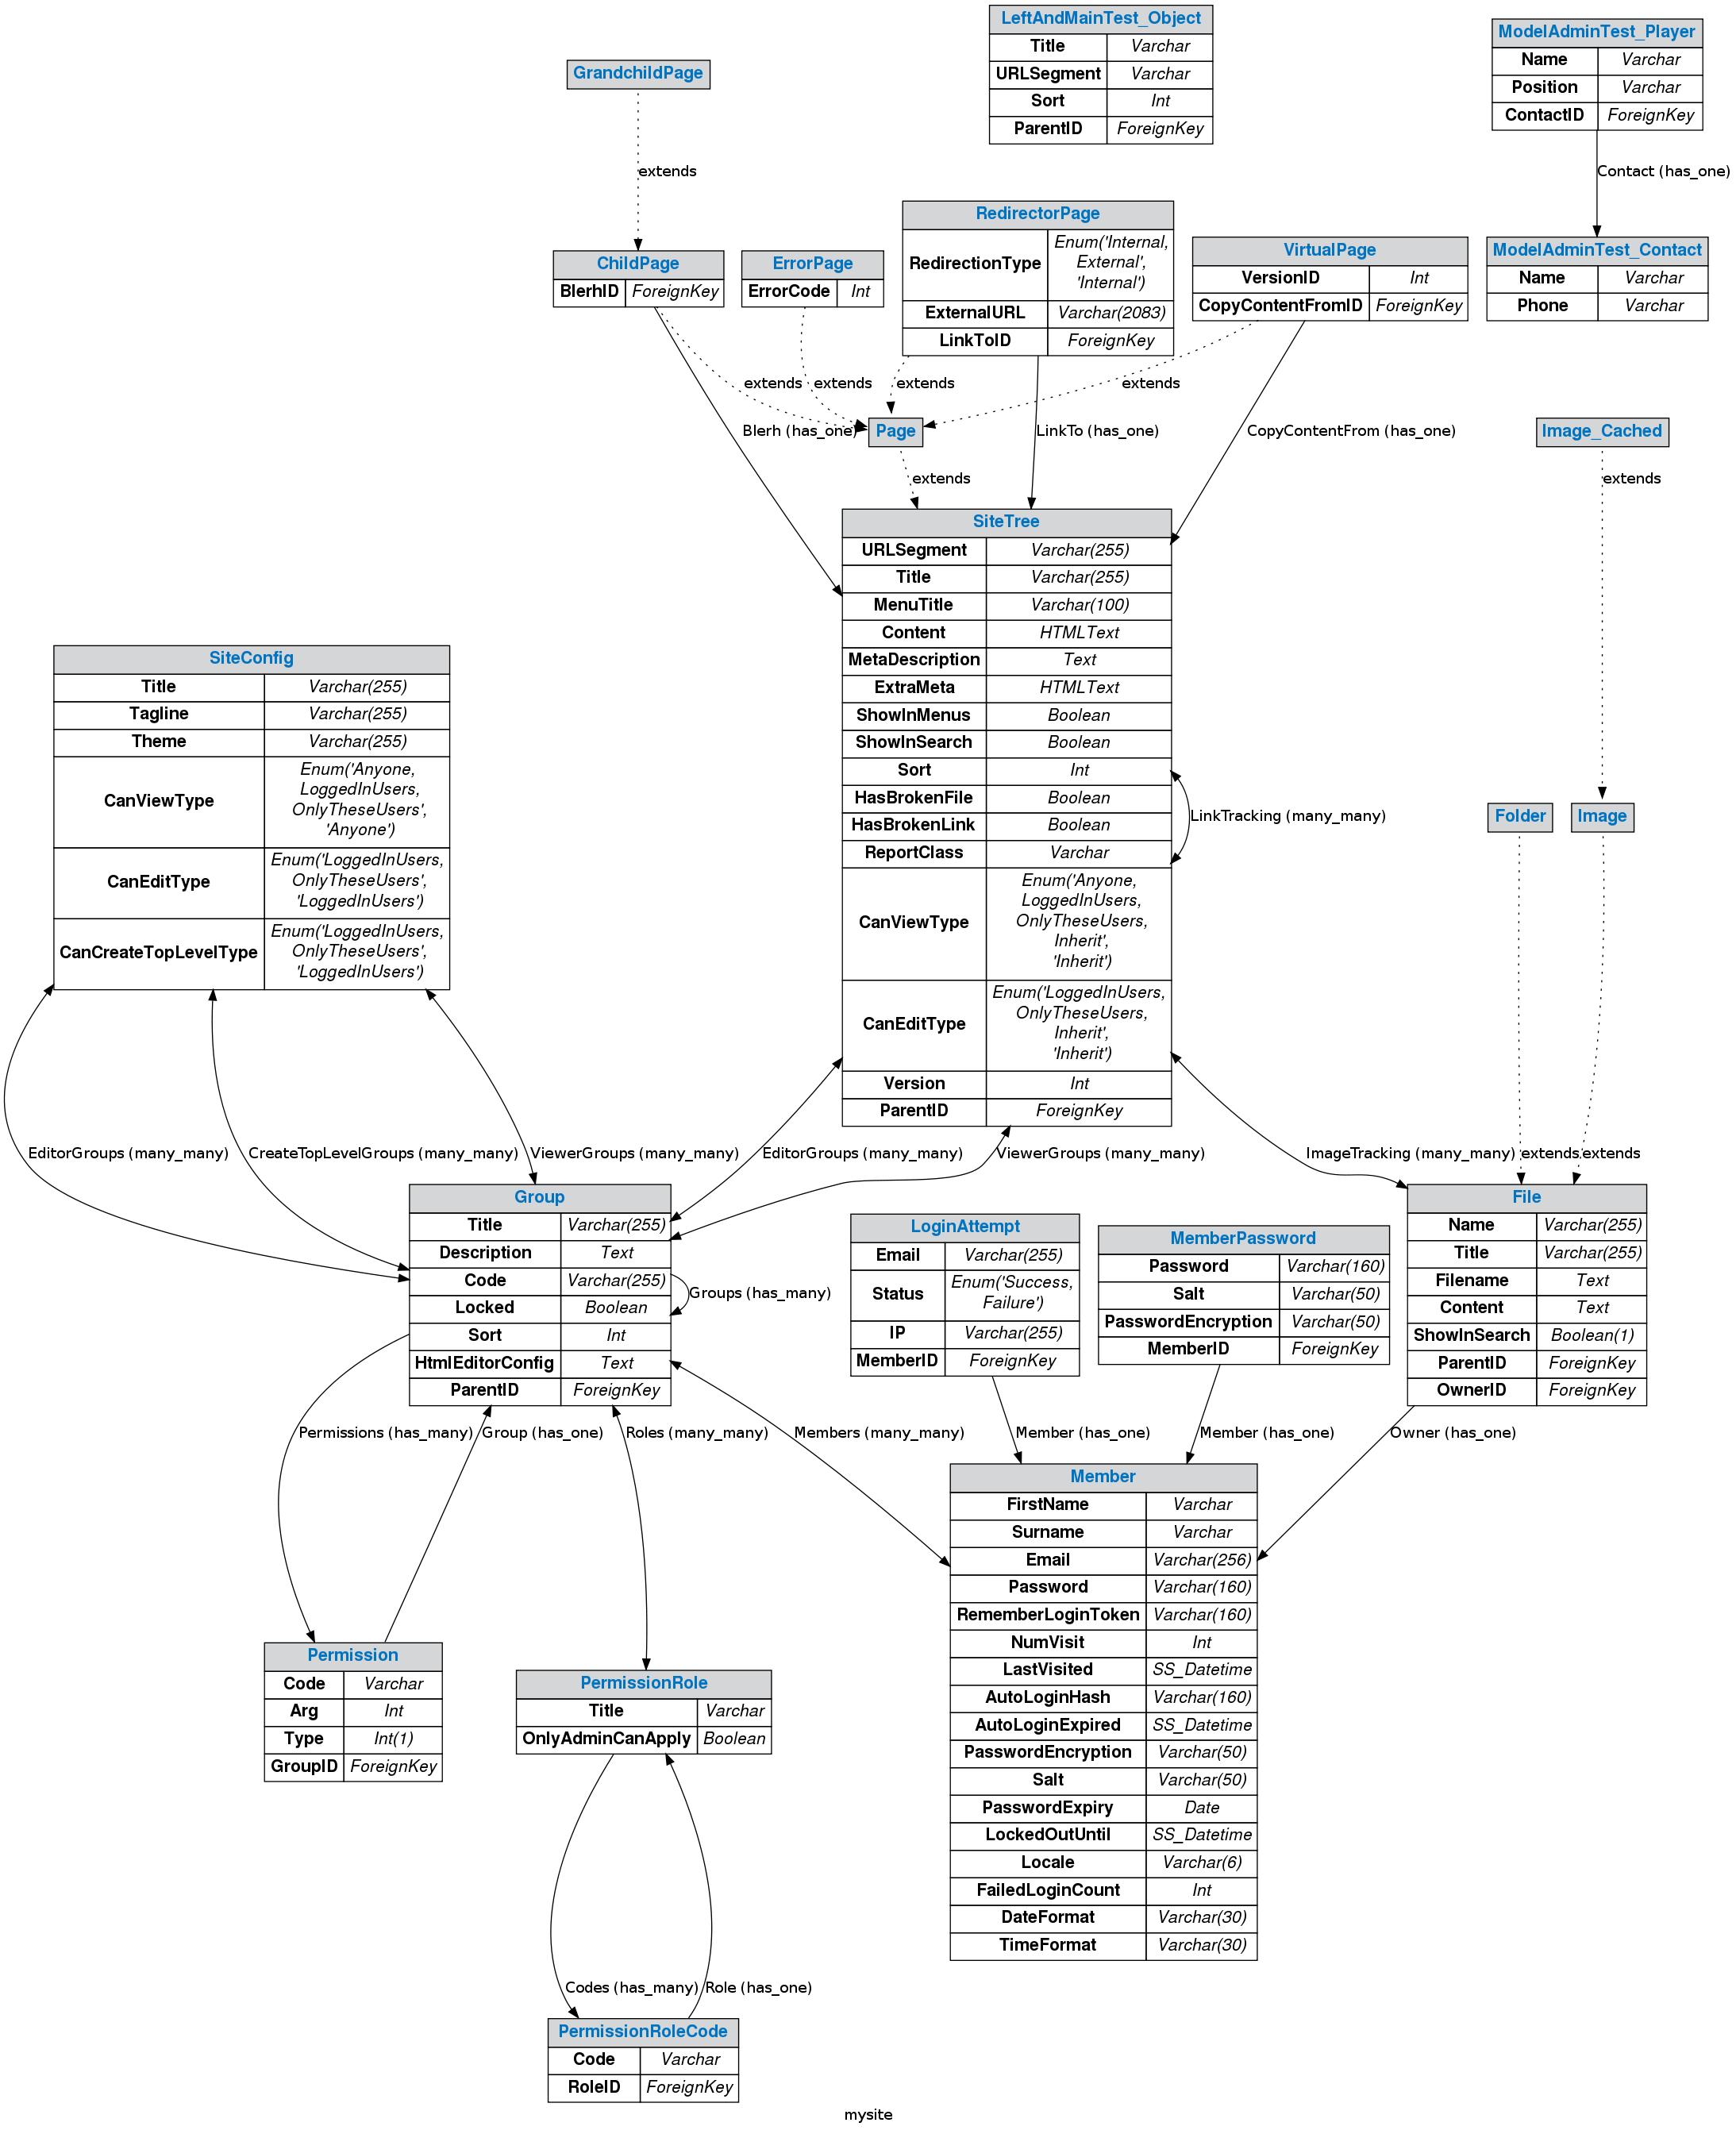 SilverGraph example